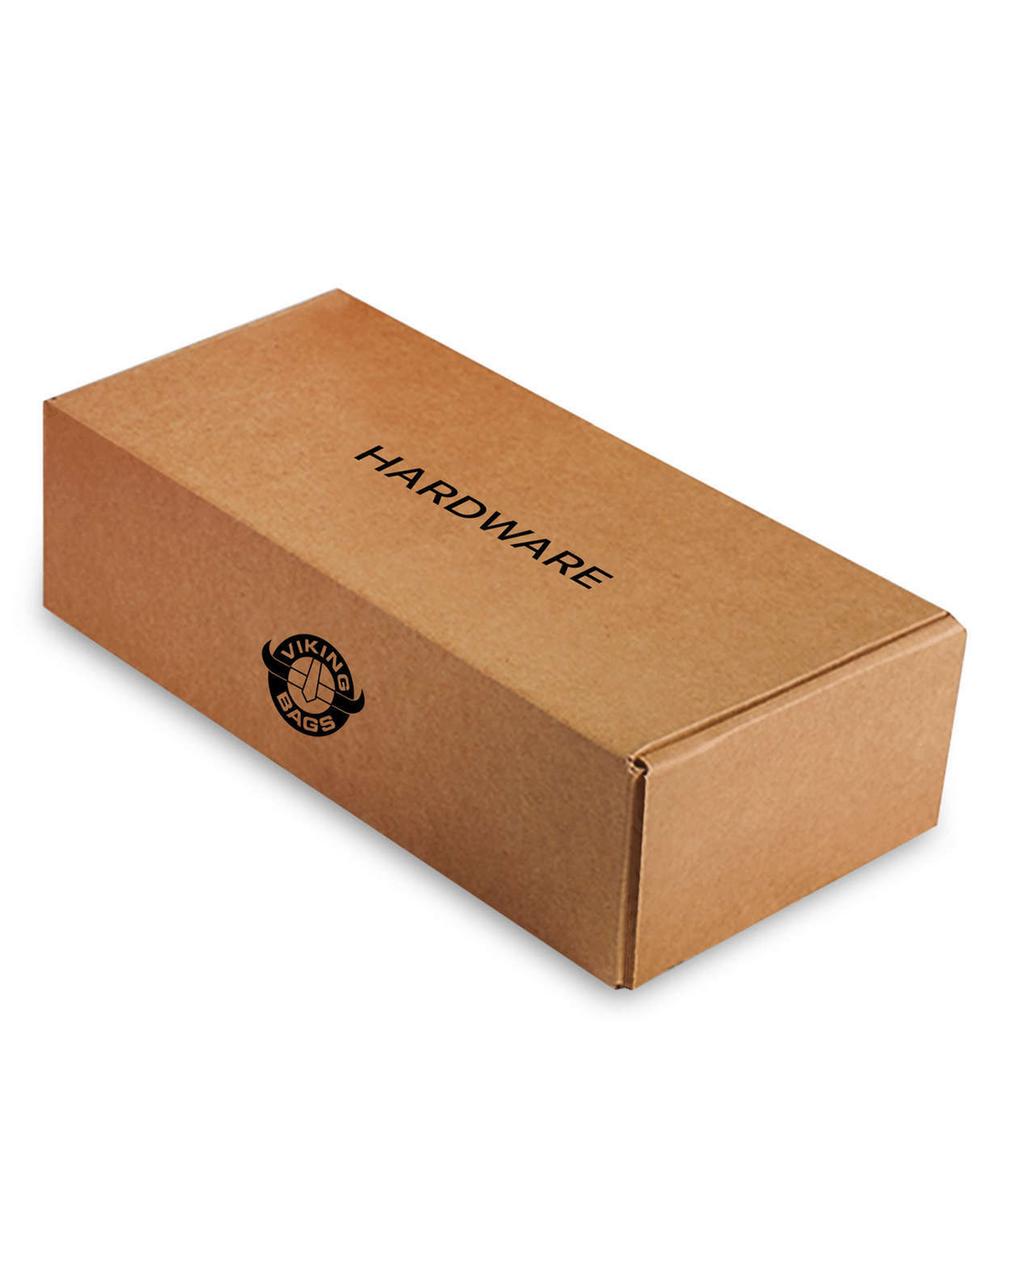 Honda VTX 1800 C Trianon Plain Leather Motorcycle Saddlebags Box